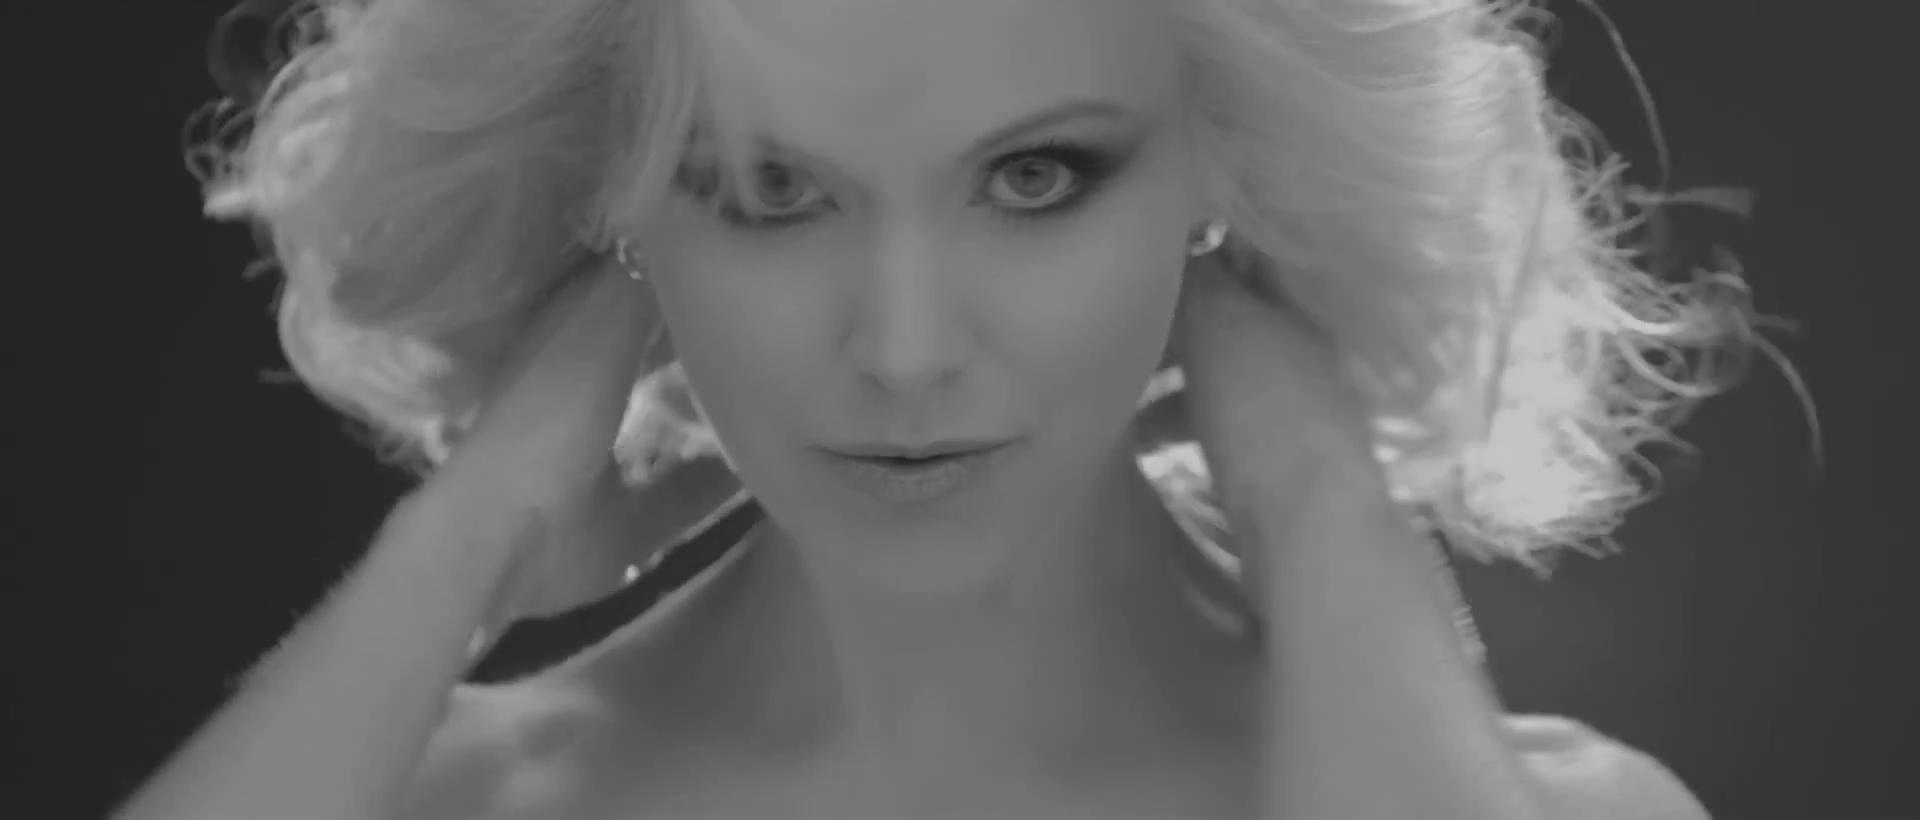 Натали - О боже какой мужчина (2013) WebRip (1080p) :: X-